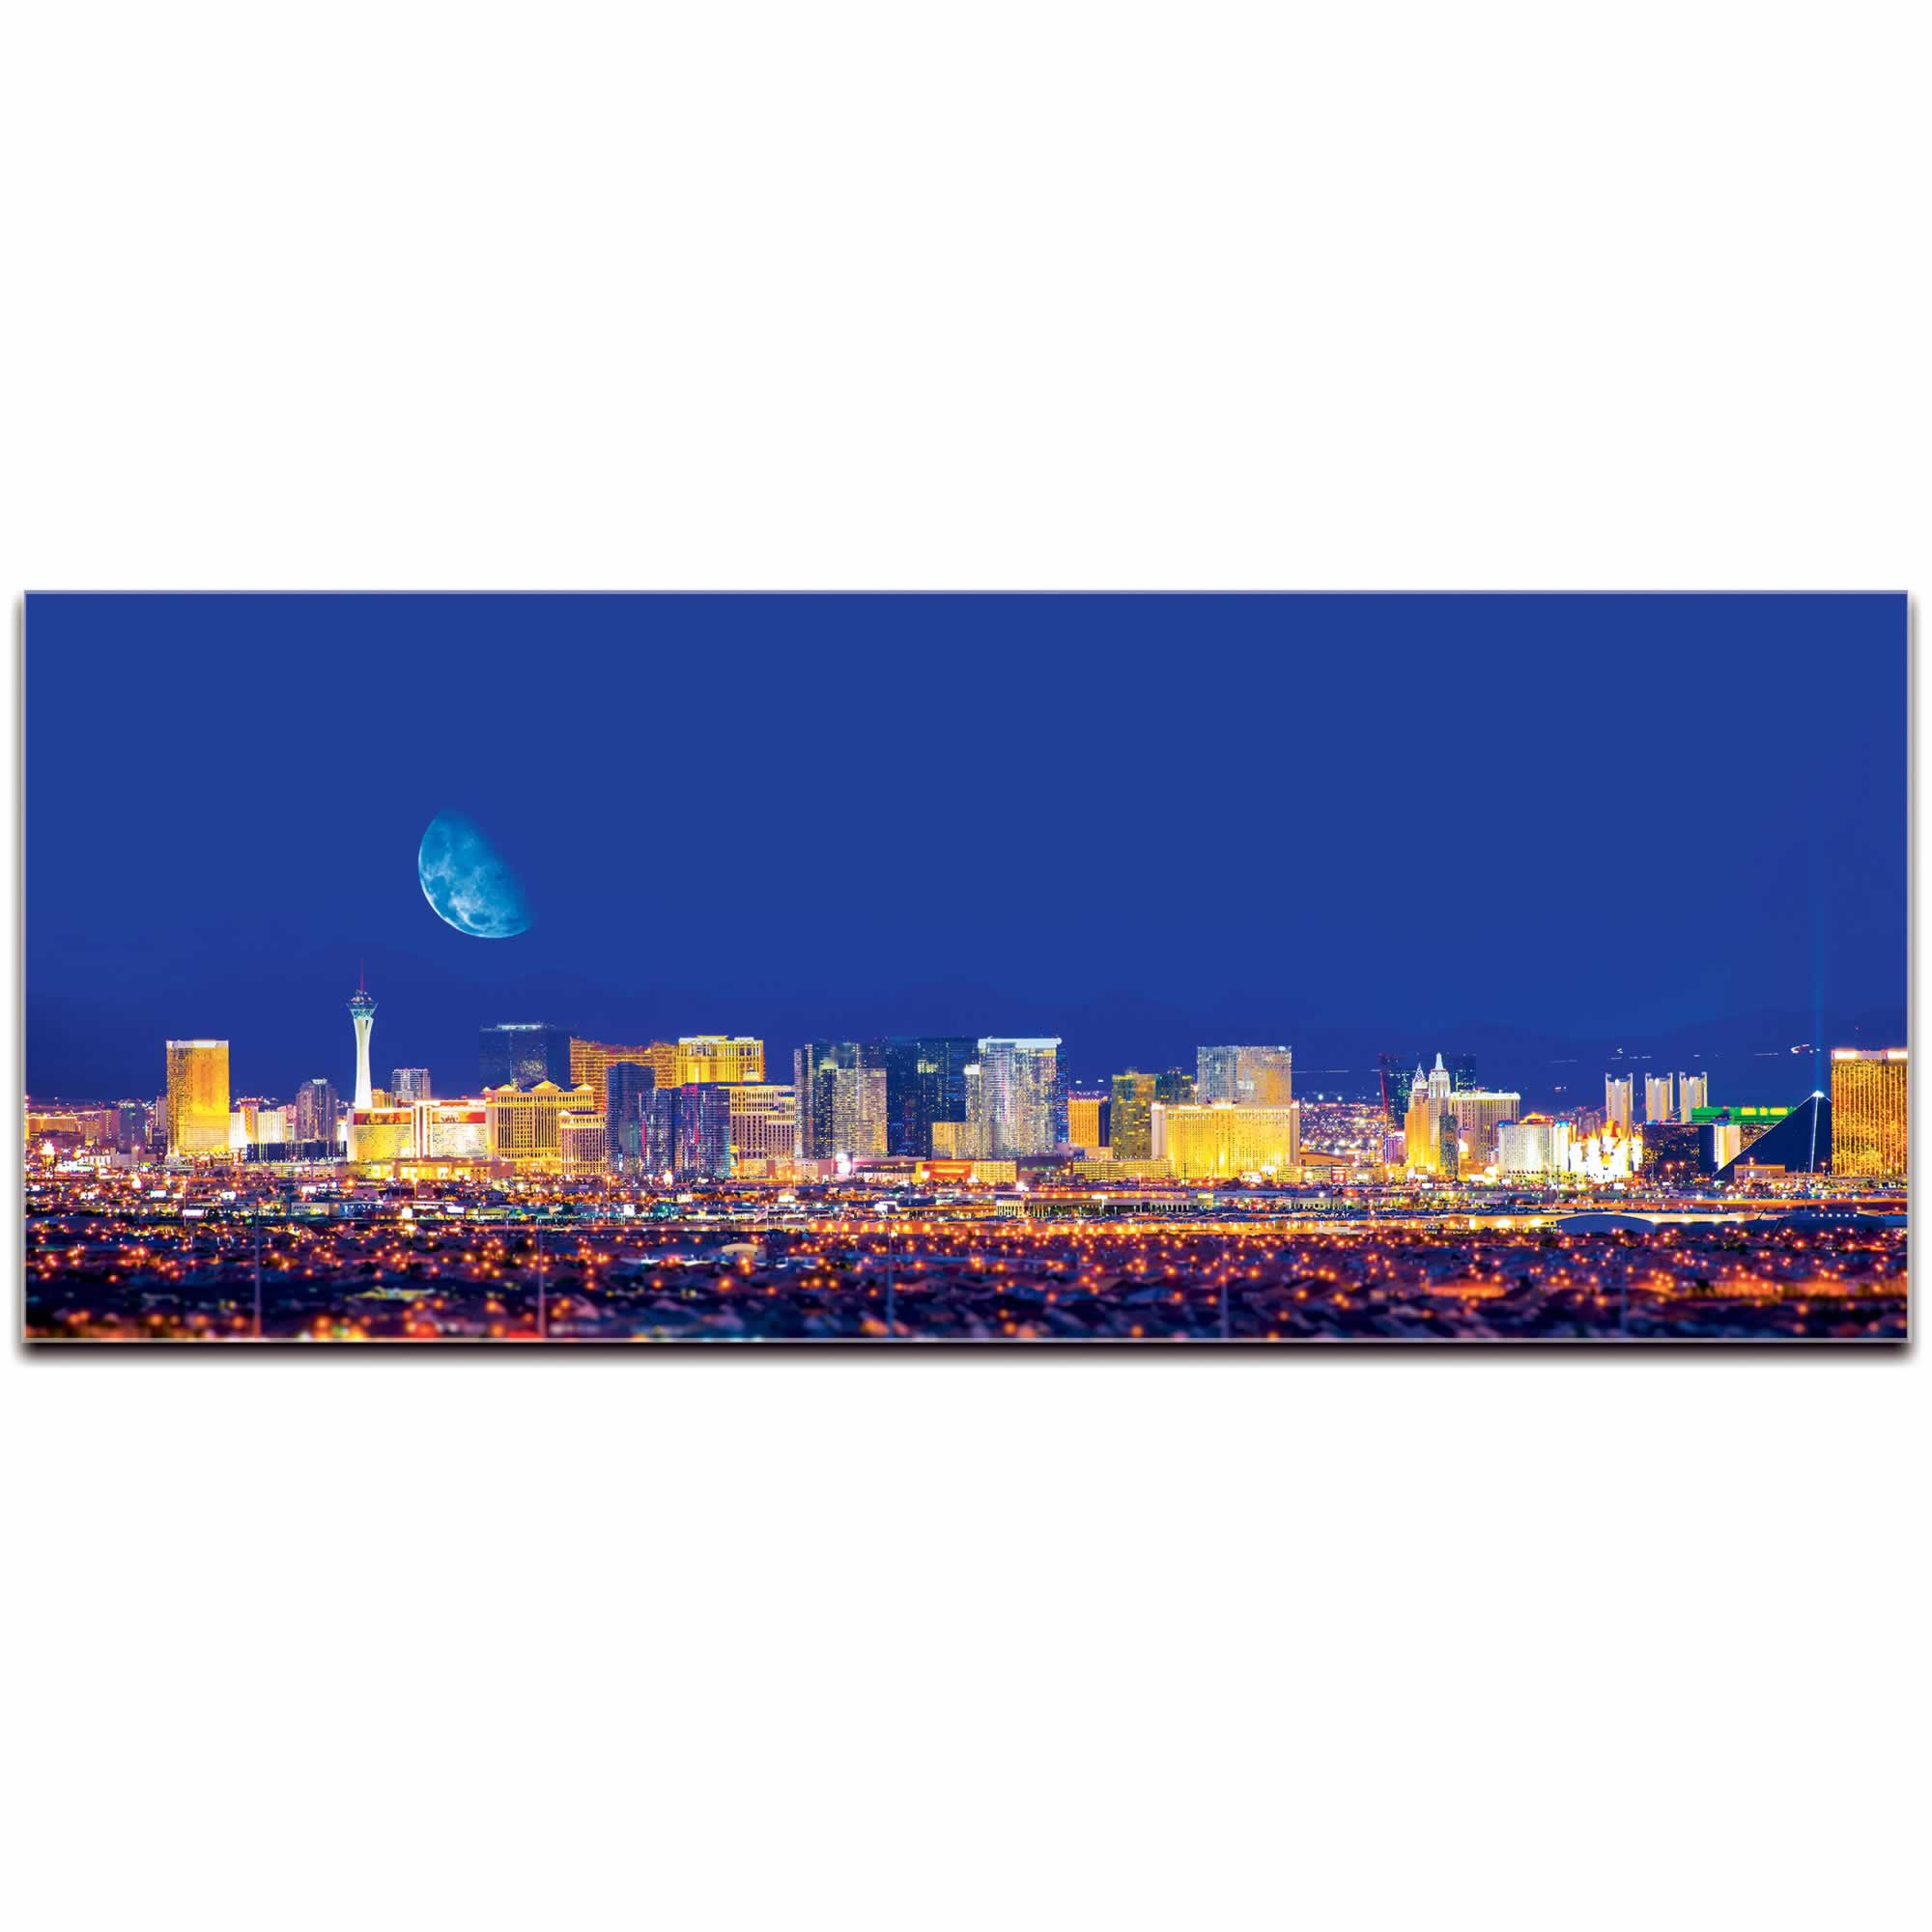 Metal Art Studio Las Vegas City Skyline Urban Modern